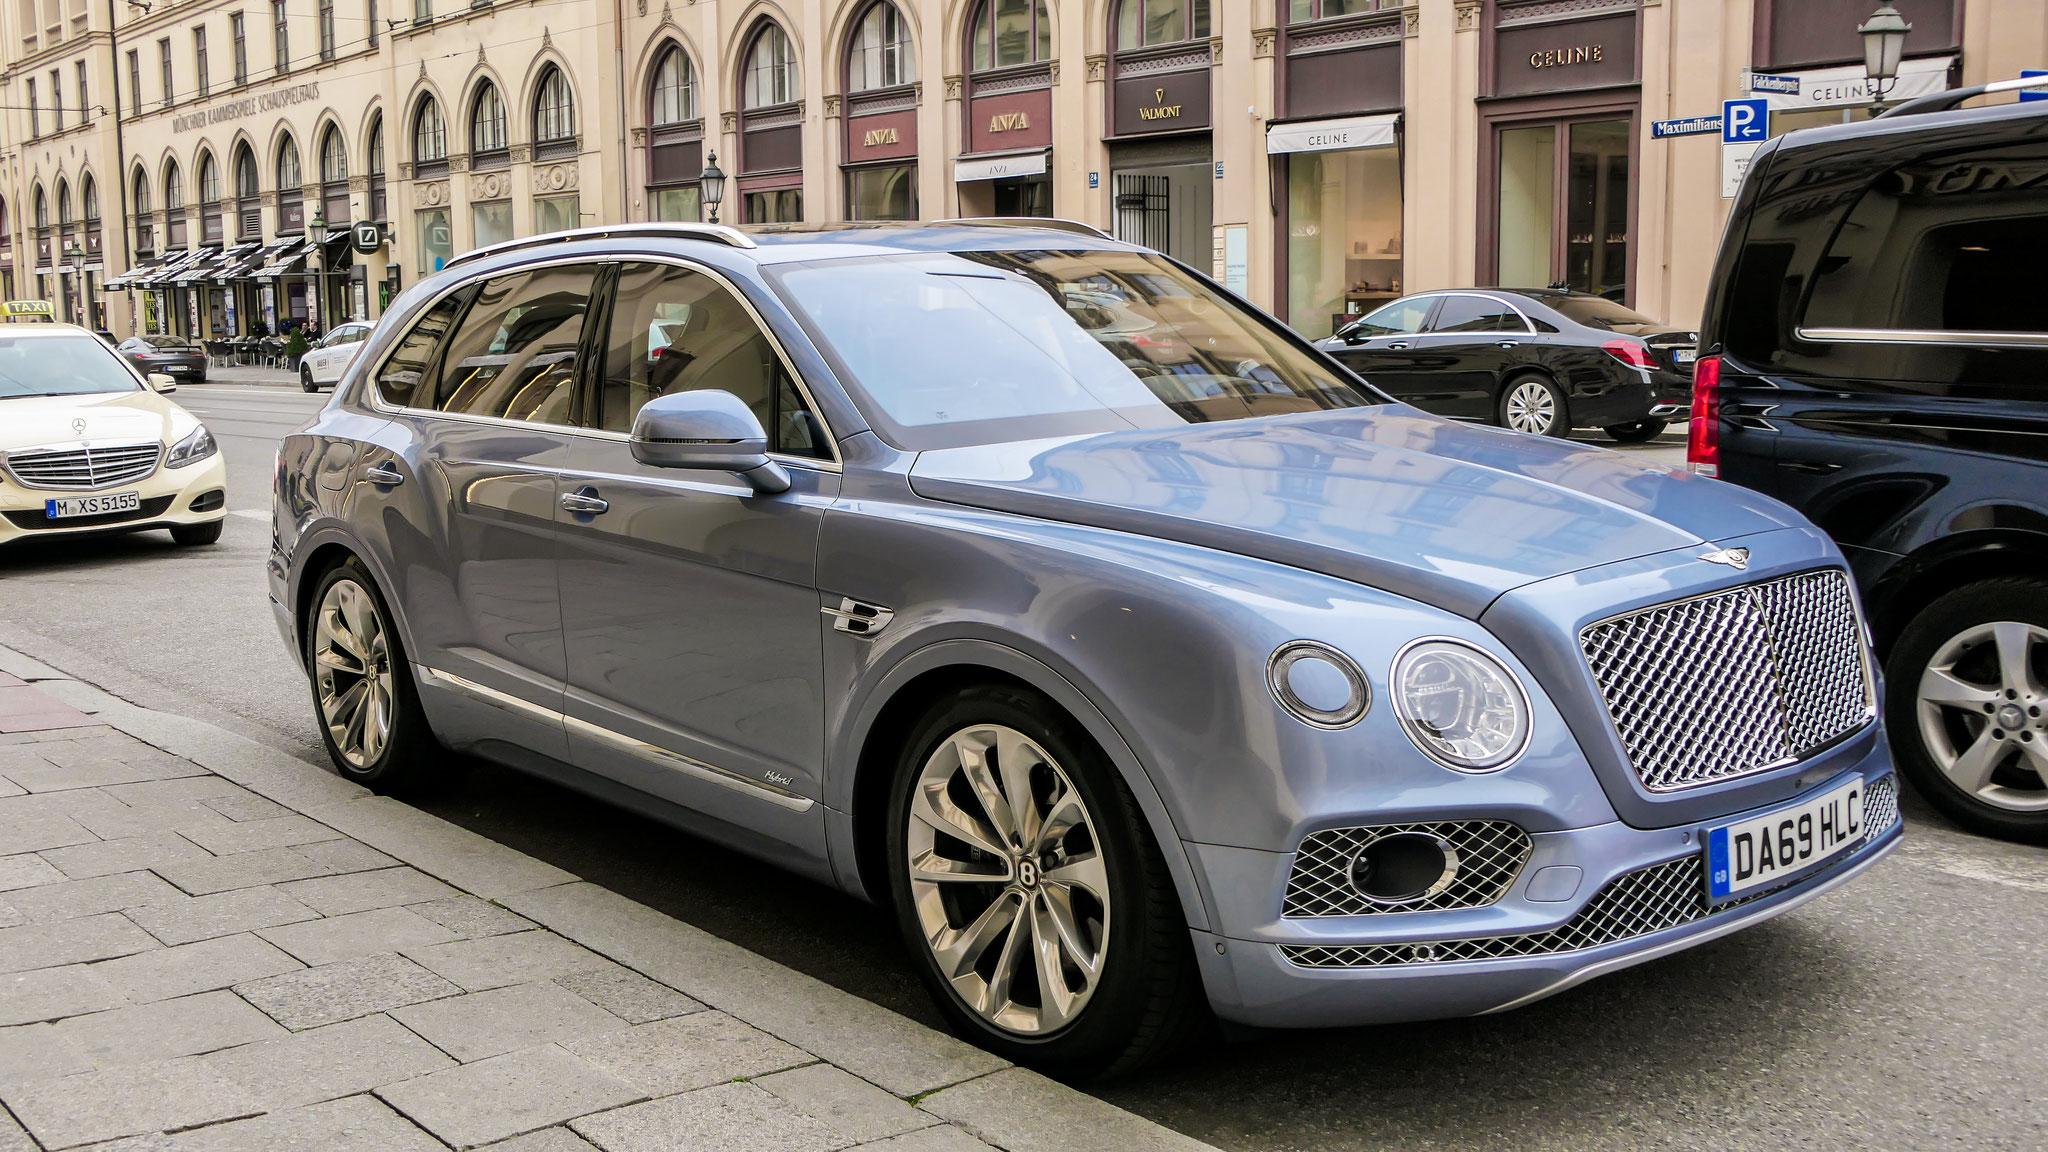 Bentley Bentayga Hybrid - DA69-HLC (GB)